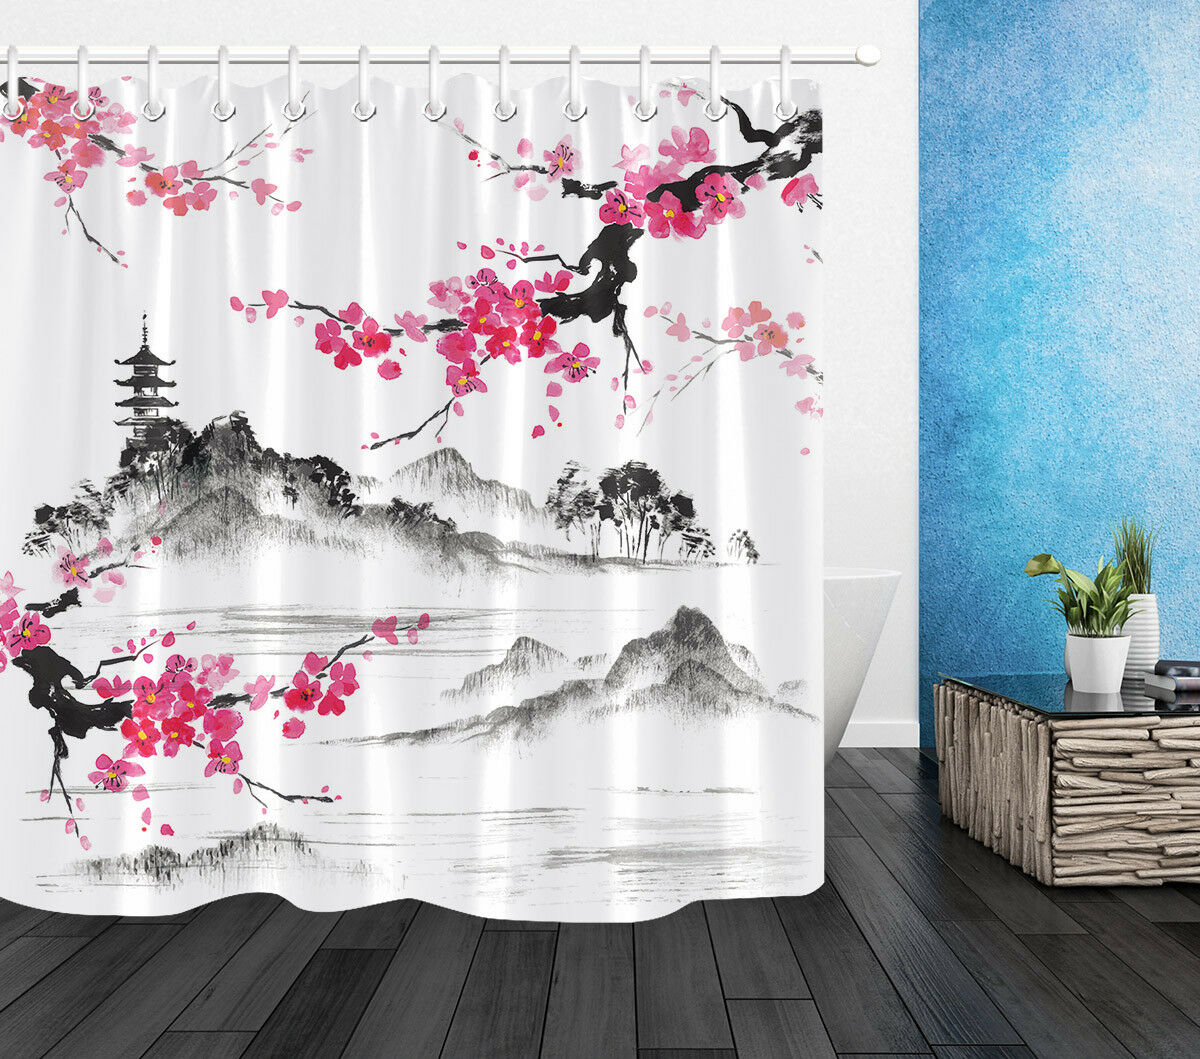 Conjunto de cortina de ducha de tela de baño estilo tradicional japonés Sakura Hills